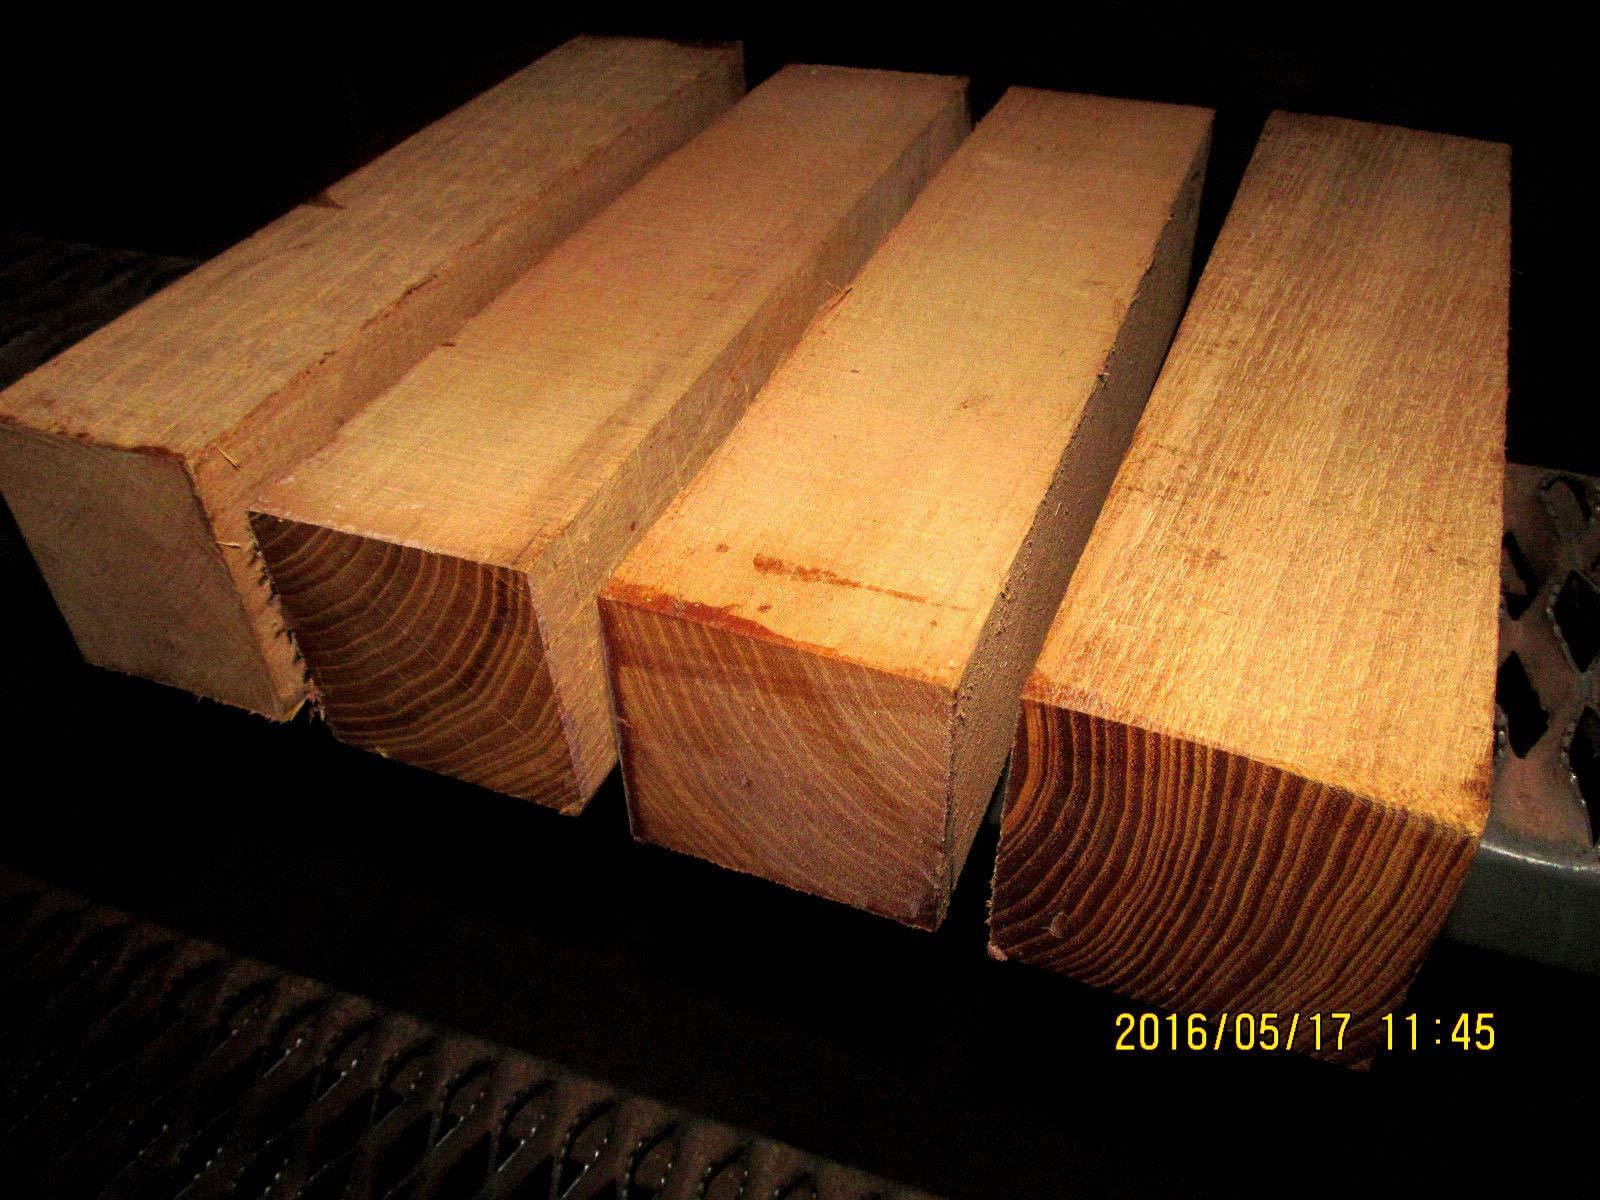 Four (4) Black Locust Turning Blanks Lathe Turning Block Lumber 3 X 3 X 12''